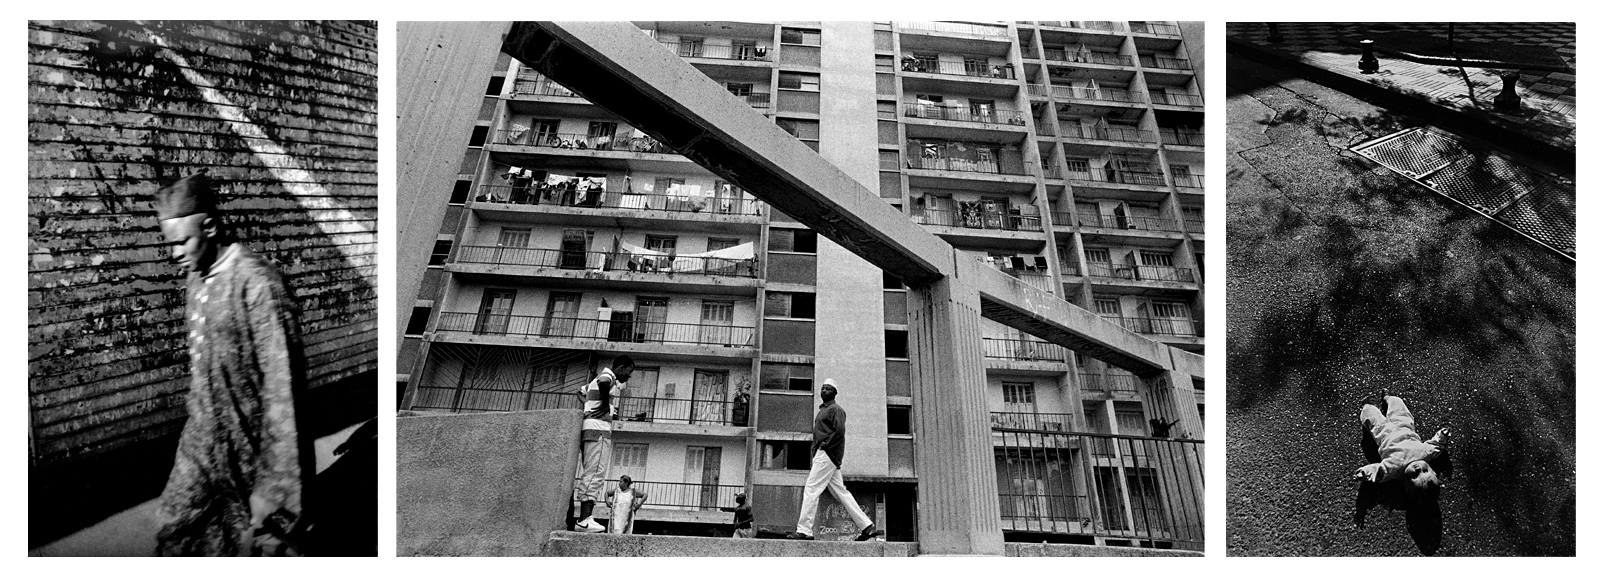 Art and Documentary Photography - Loading 022_Marseille___Fabio_Sgroi.jpg